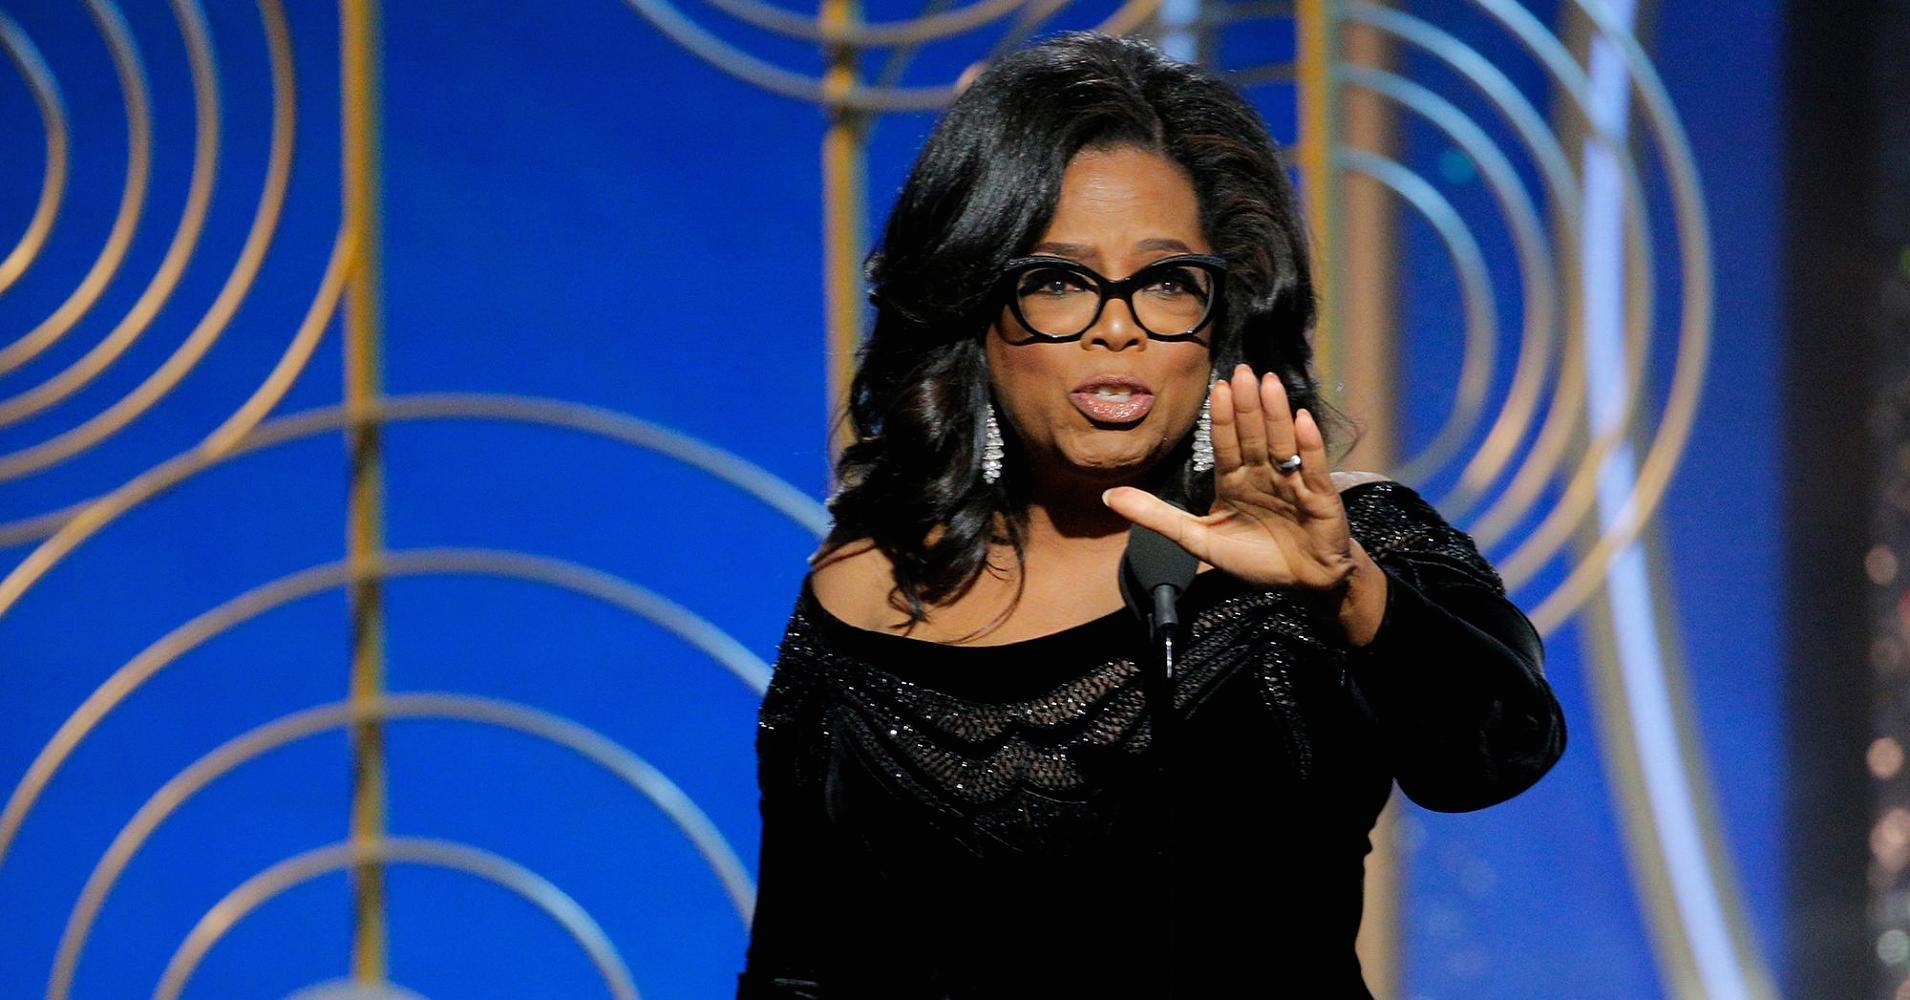 Sorry Kenyans Oprah is not coming to Kogelo - Obama's team